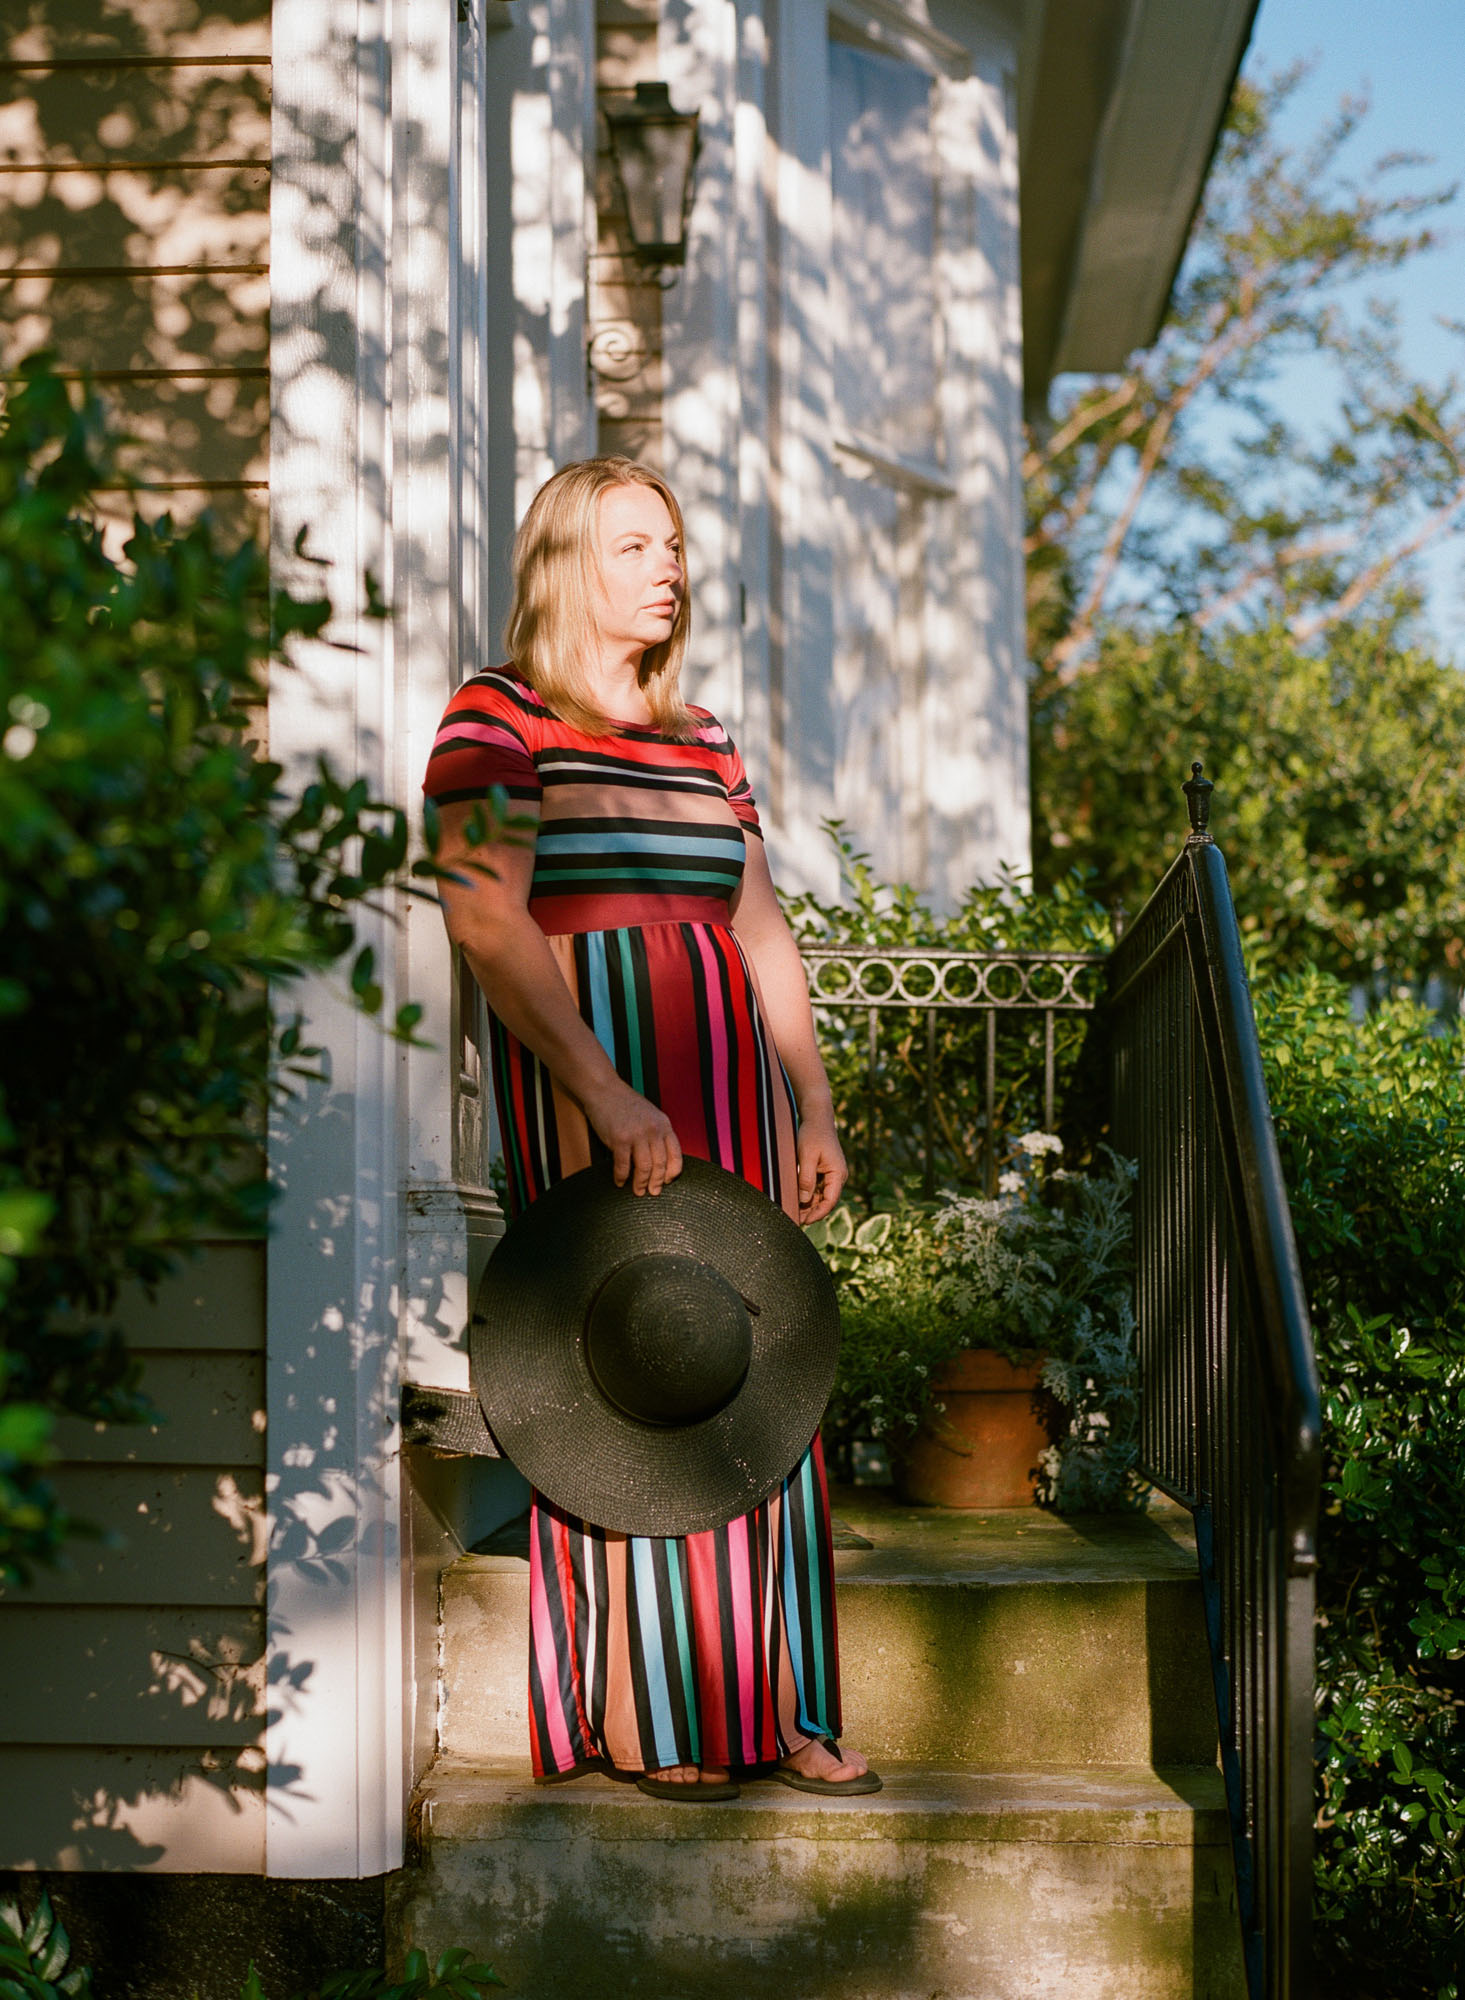 raleigh-film-portrait-photographer-009